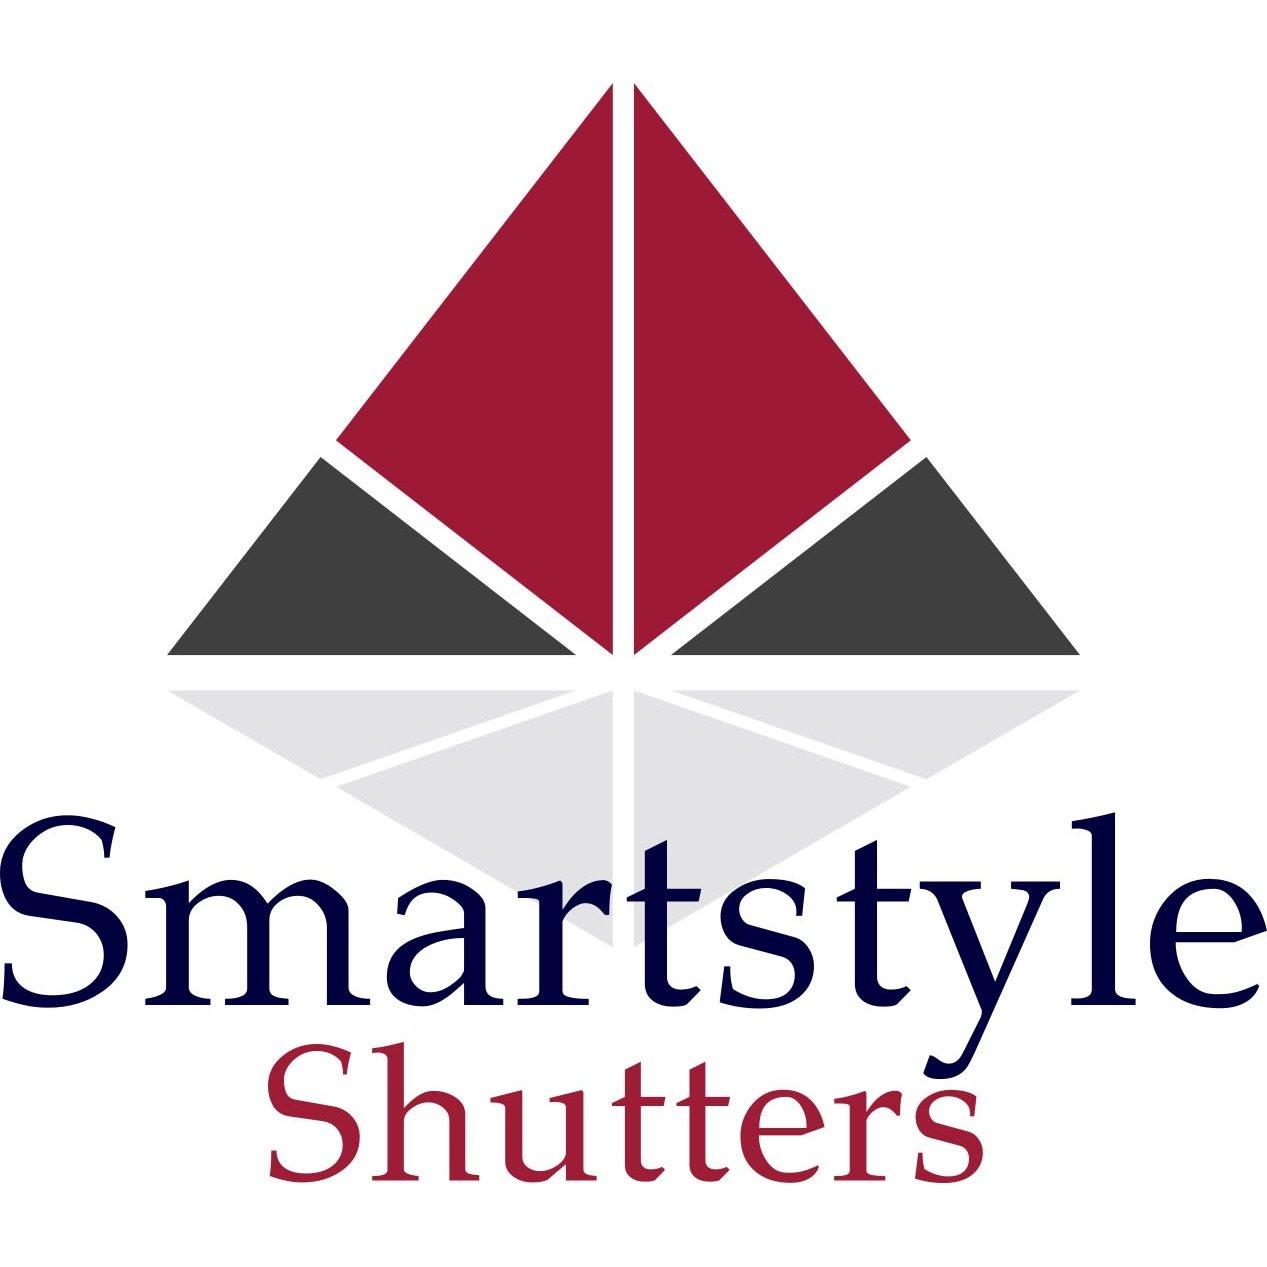 Smartstyle Shutters Ltd - Sandhurst, Hampshire GU47 0YU - 01344 723128 | ShowMeLocal.com